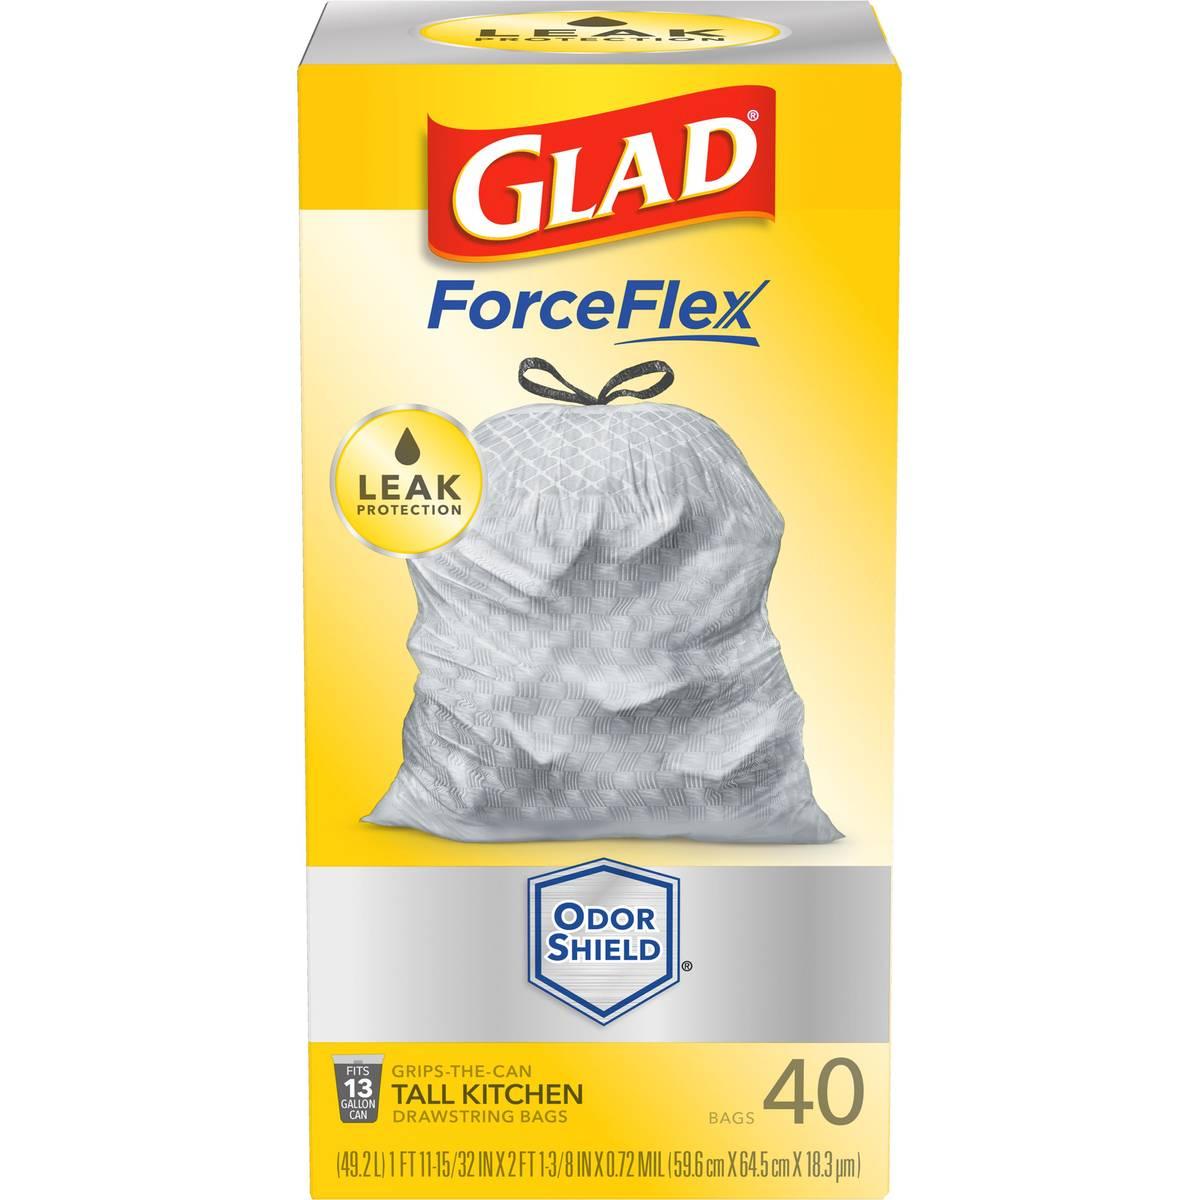 Glad ForceFlex Plus Drawstring Unscented White Odor Shield 13 Gallon ...